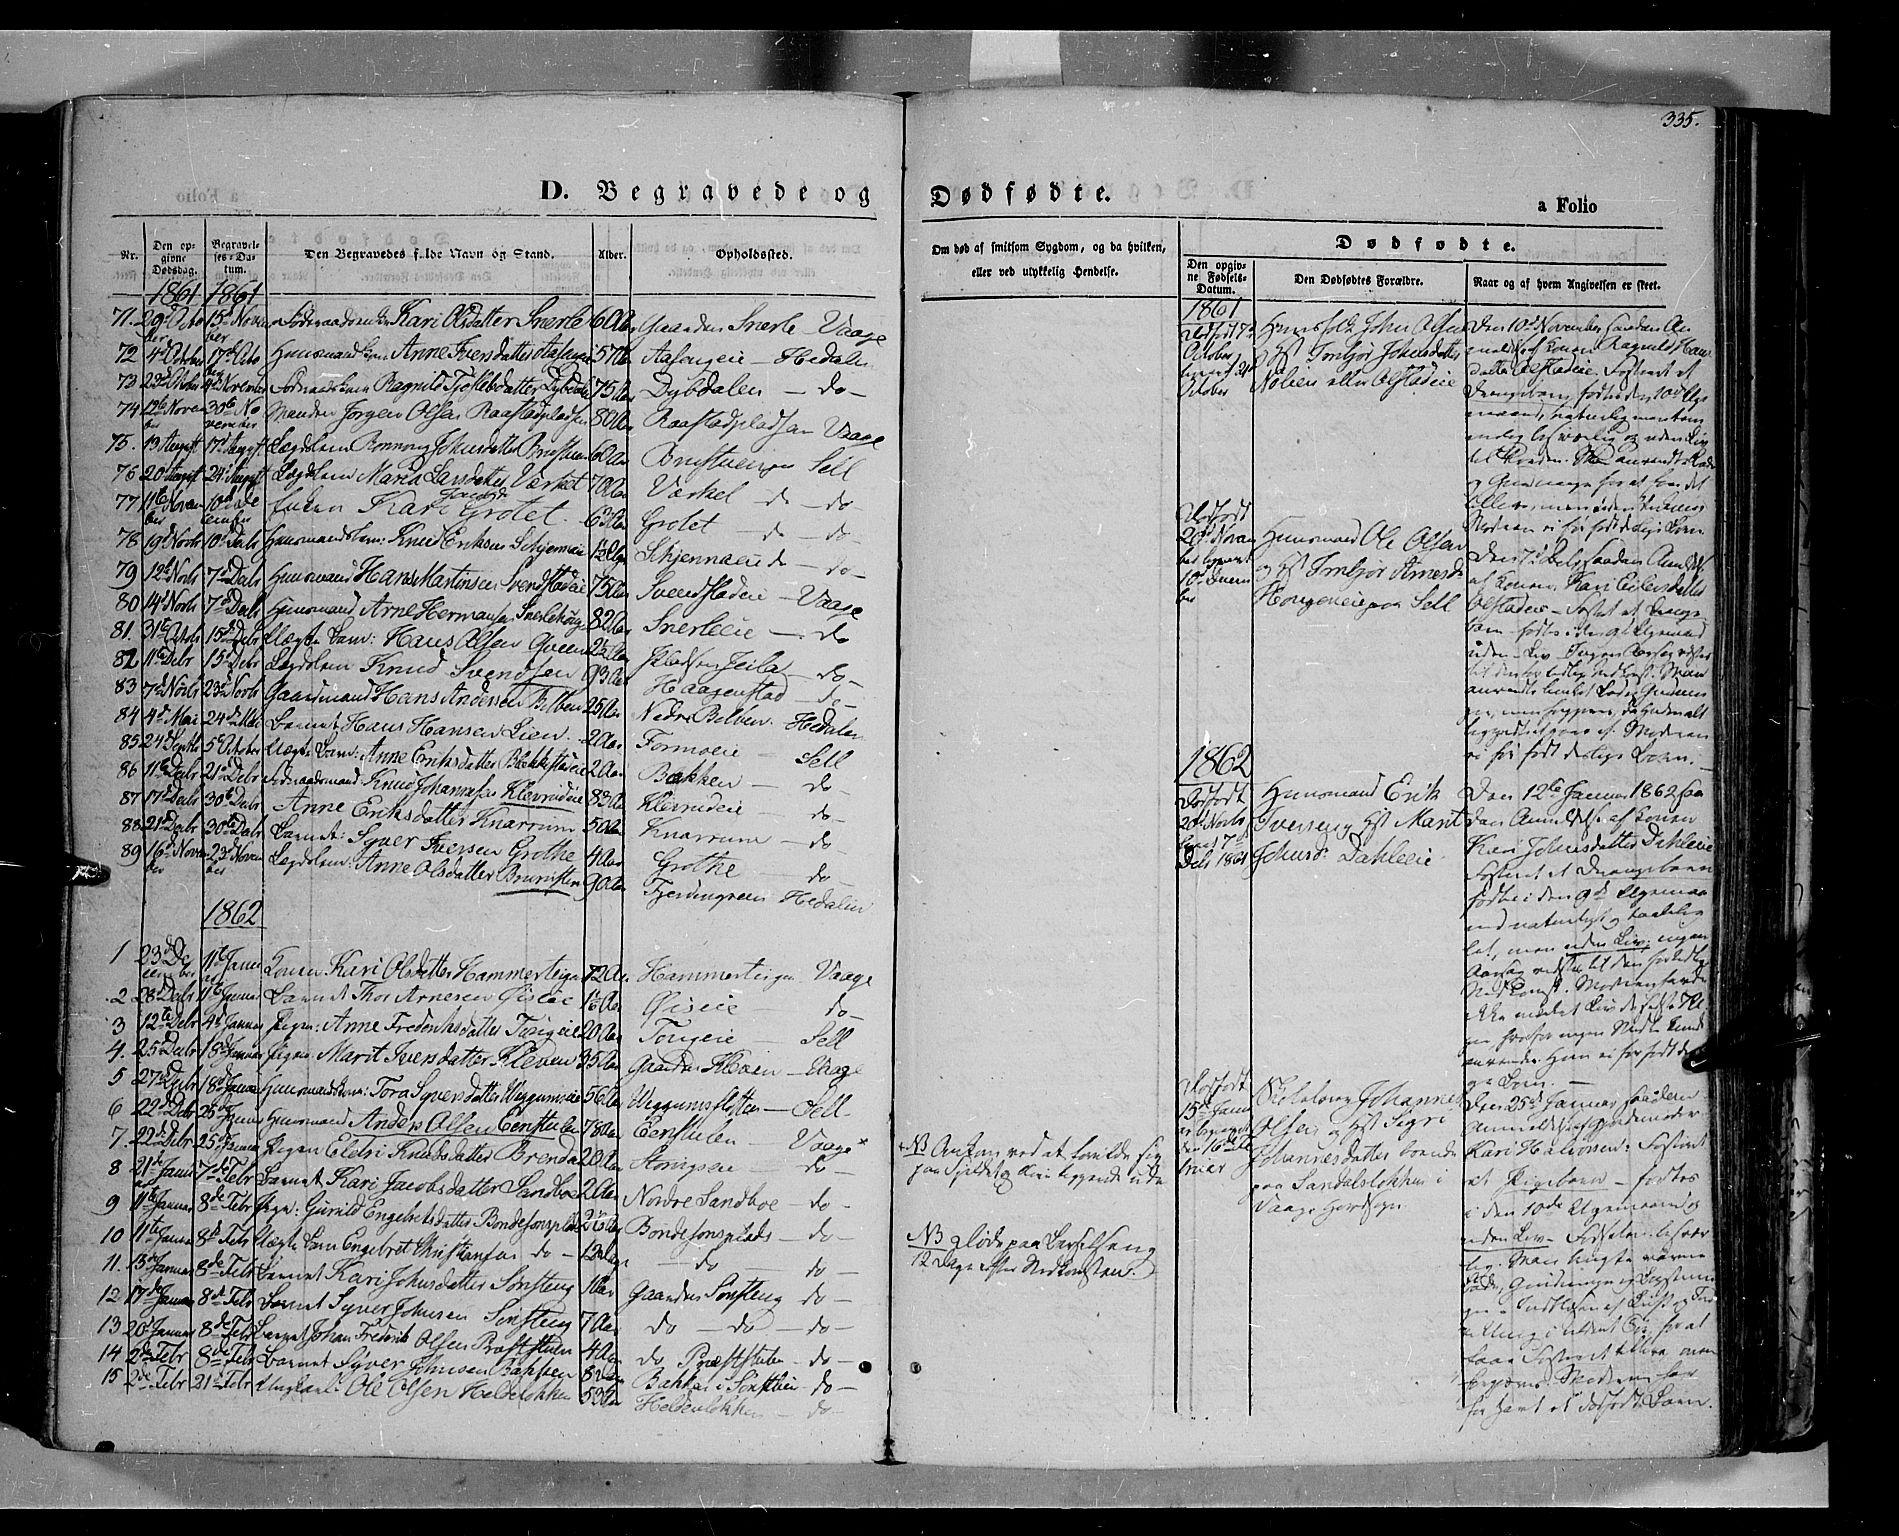 SAH, Vågå prestekontor, Ministerialbok nr. 6 /1, 1856-1872, s. 335